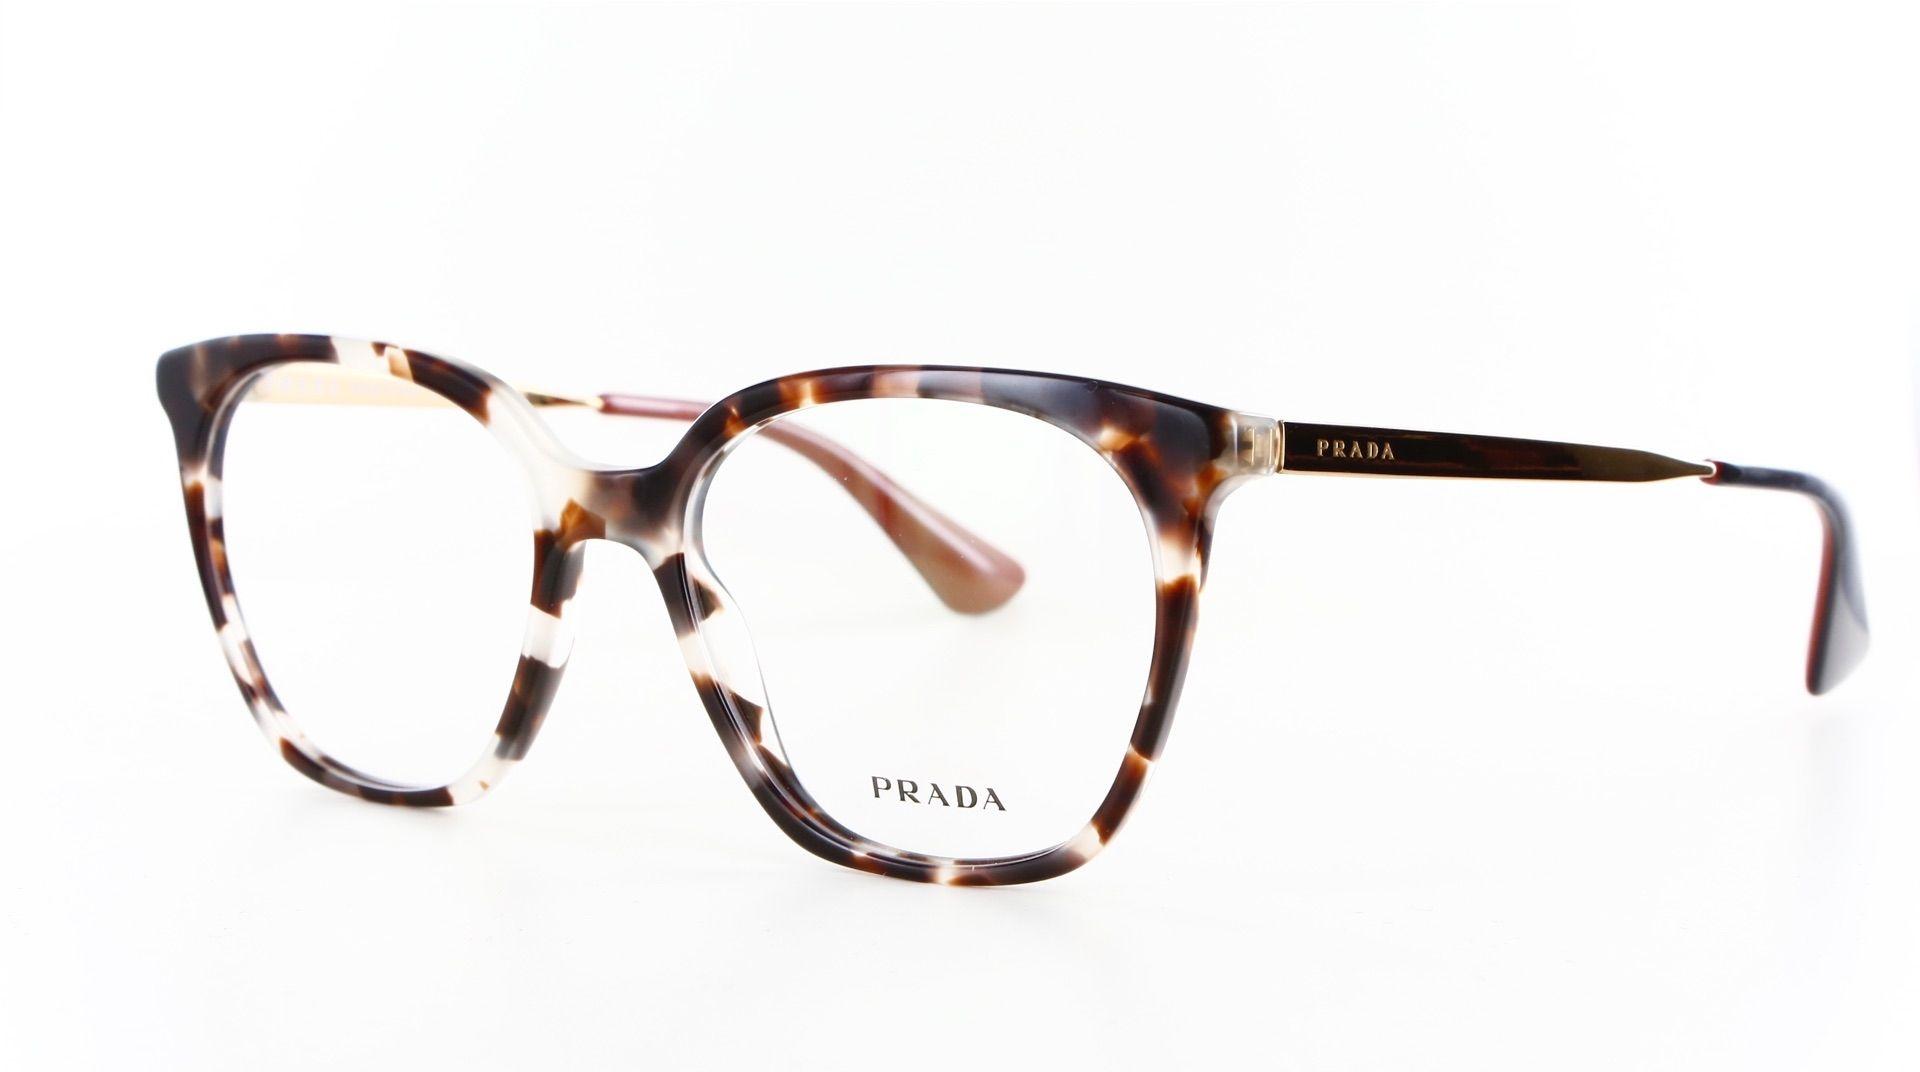 super populair laatste mode betaalbare prijs Prada VPR11T UAO dames bril in kunststof - Bril en Prada